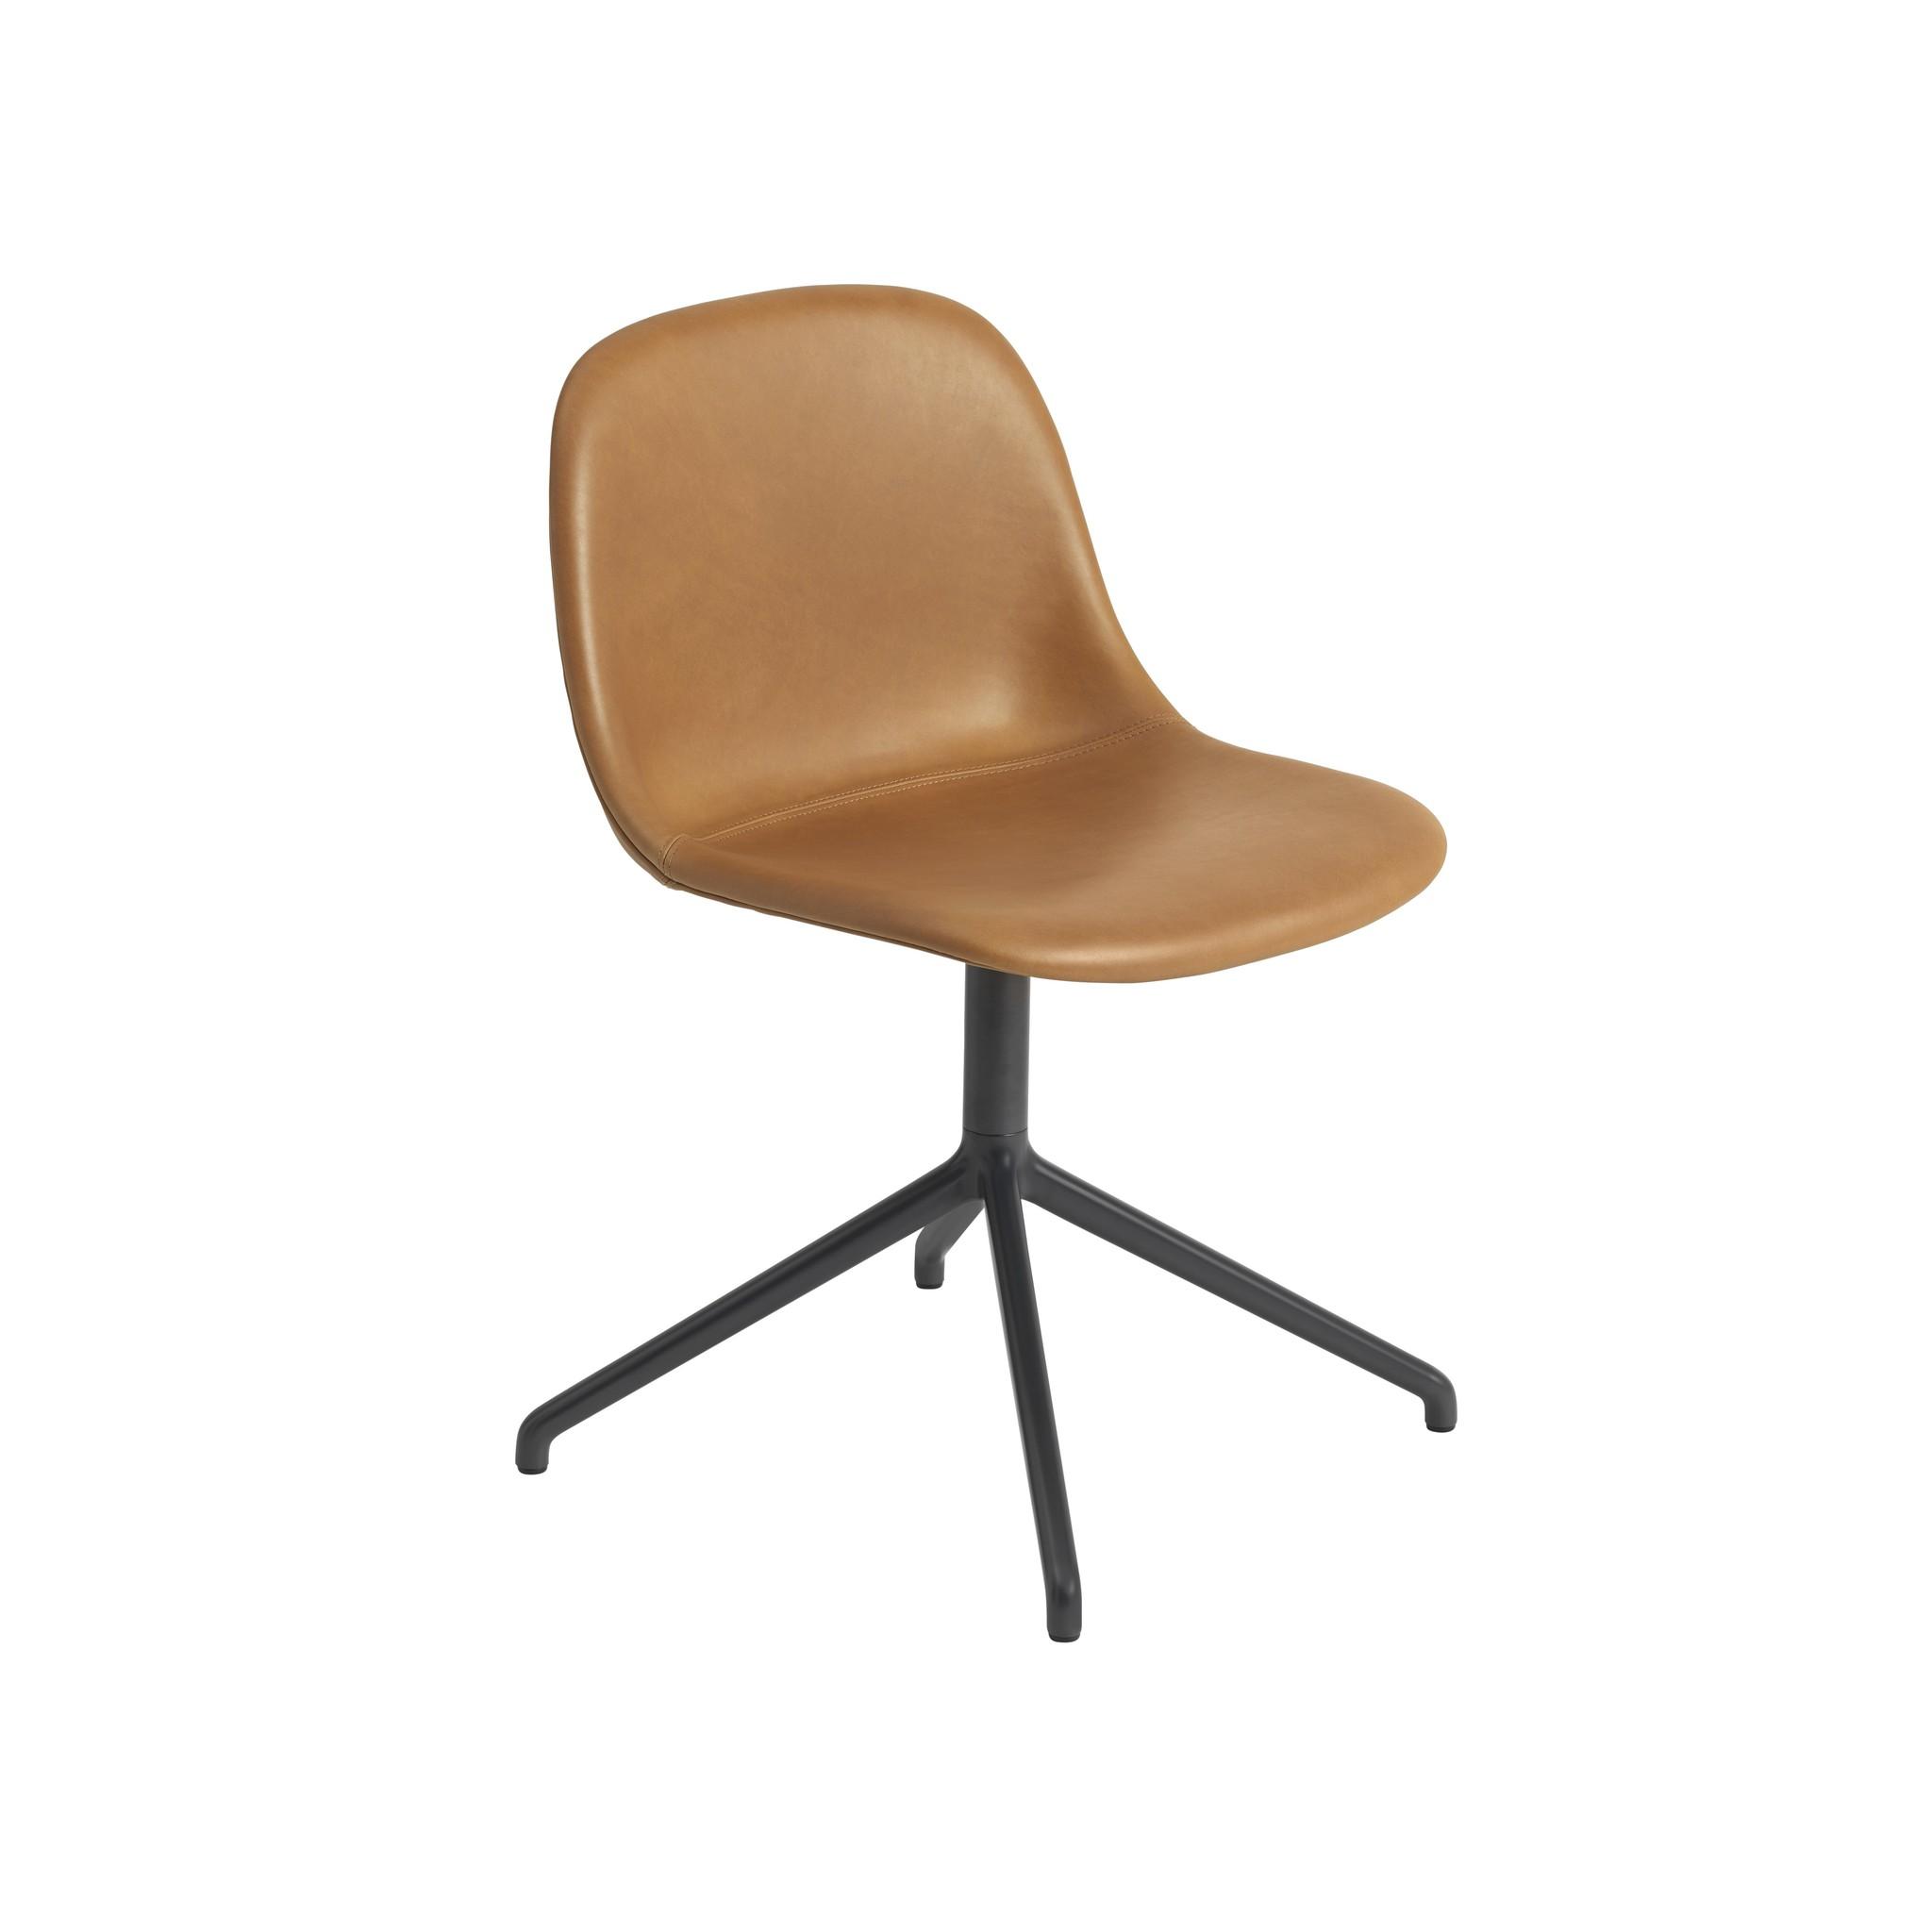 Fiber side chair swivel base w.o. return-9